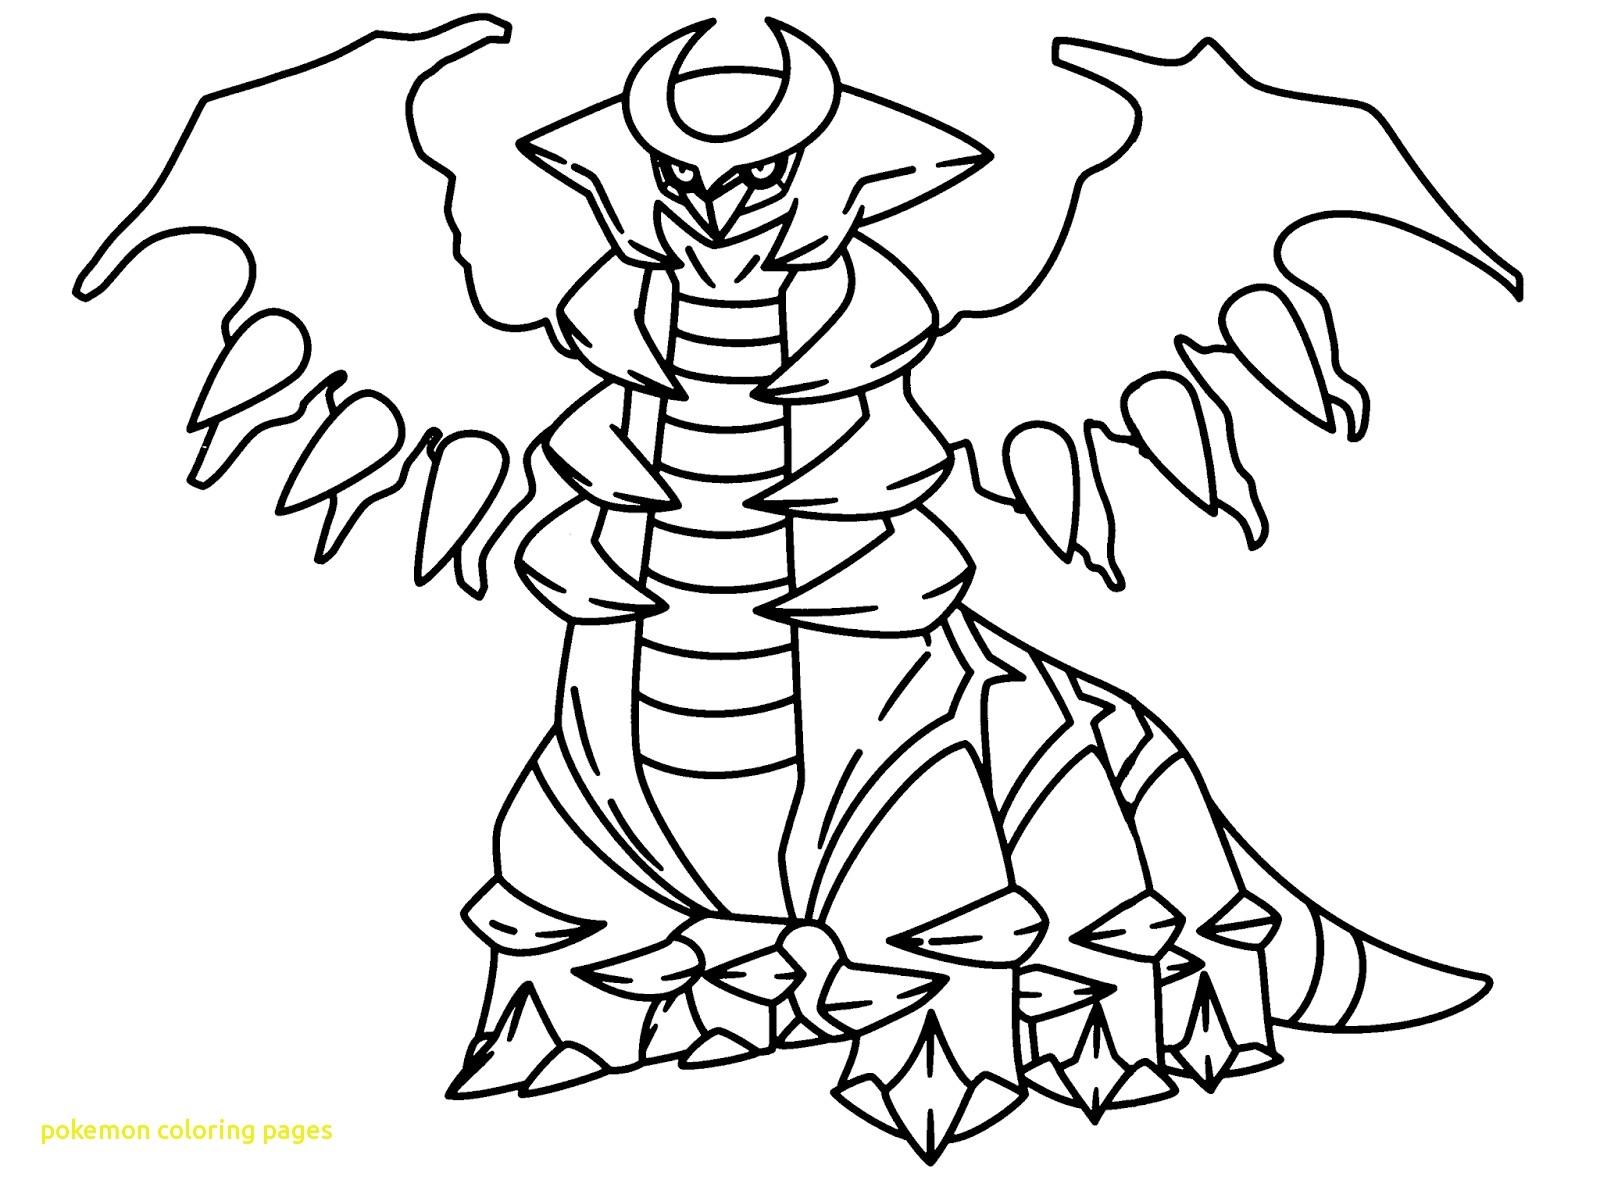 1600x1187 New Pokemon Coloring Pages Entei Houndoom Pokemon Vitlt Free